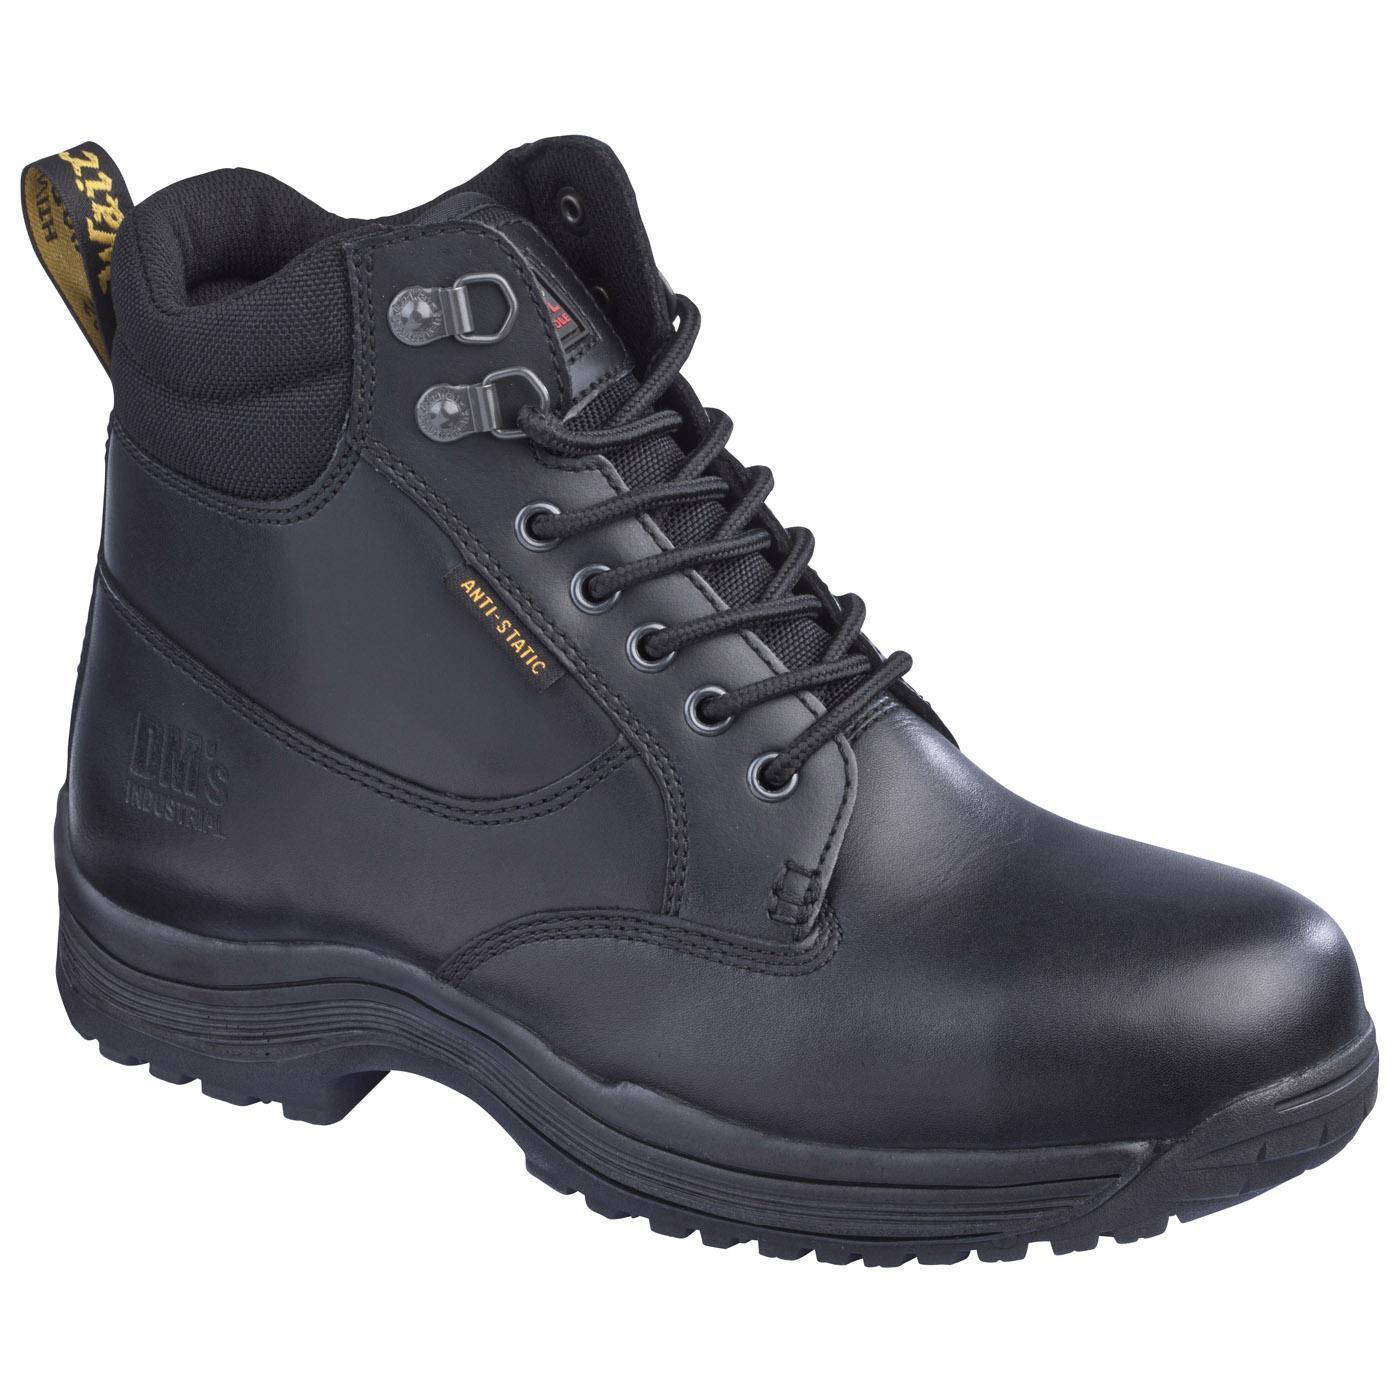 dr martens workman steel toe sd work boot 14133001